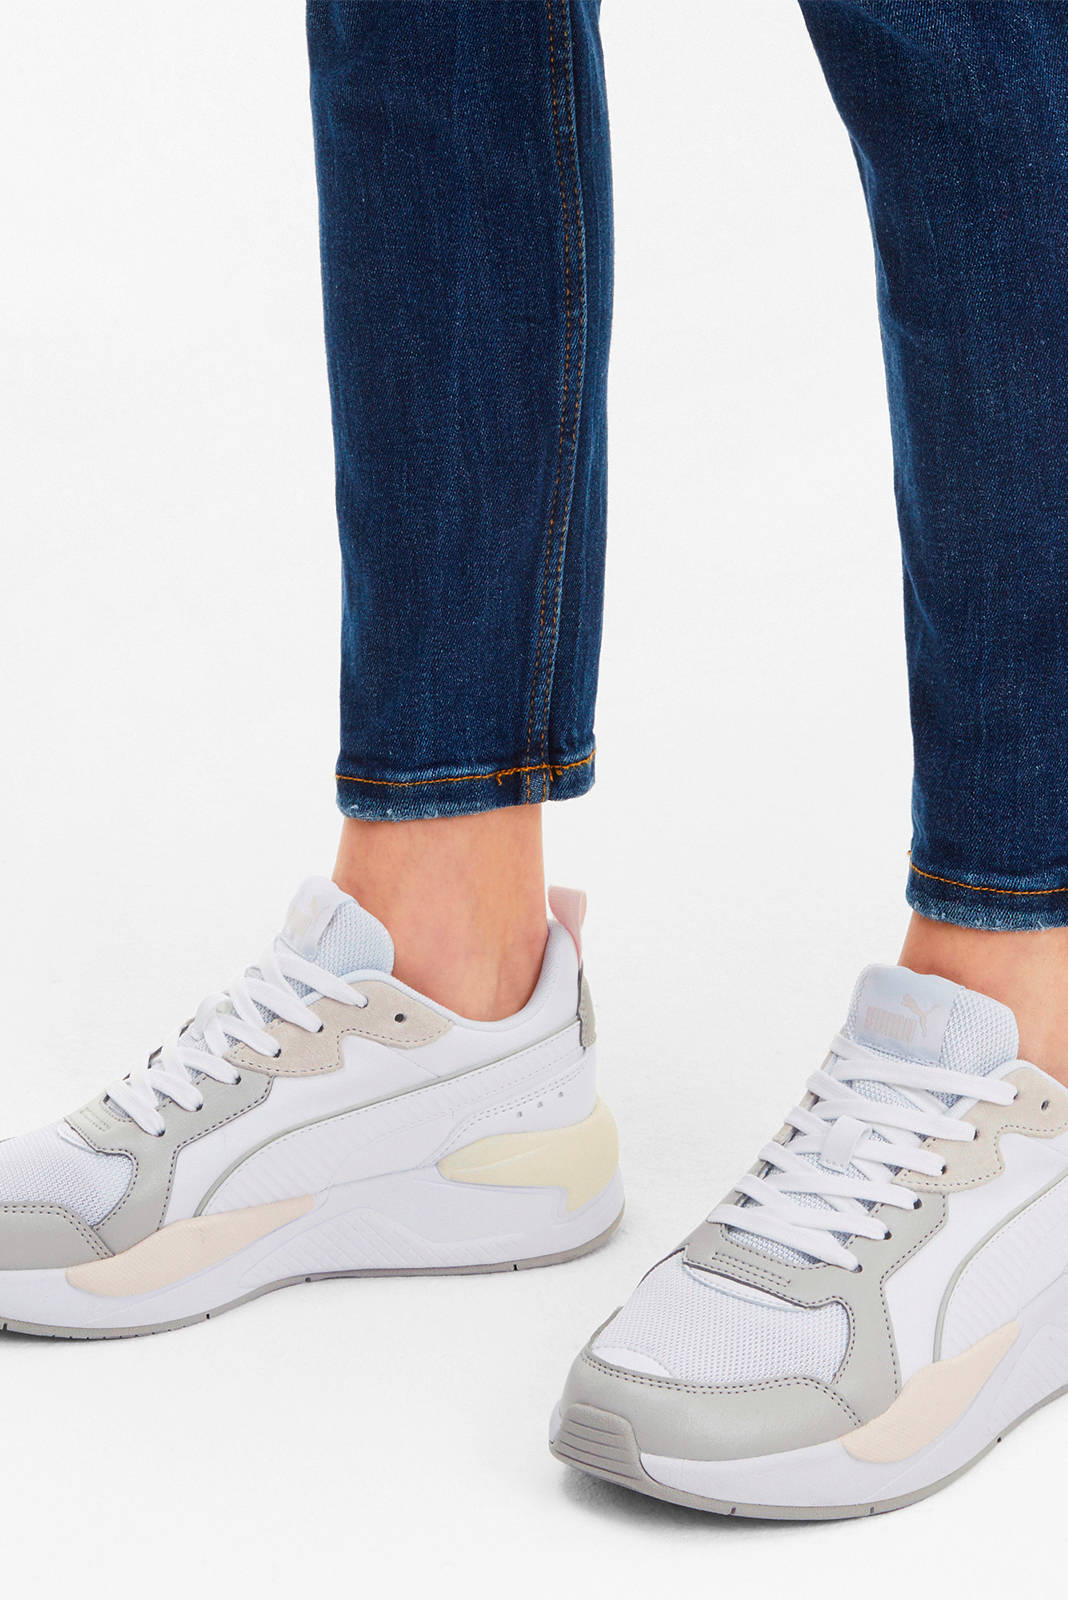 Puma X-Ray Game sneakers wit/lichtgrijs | wehkamp